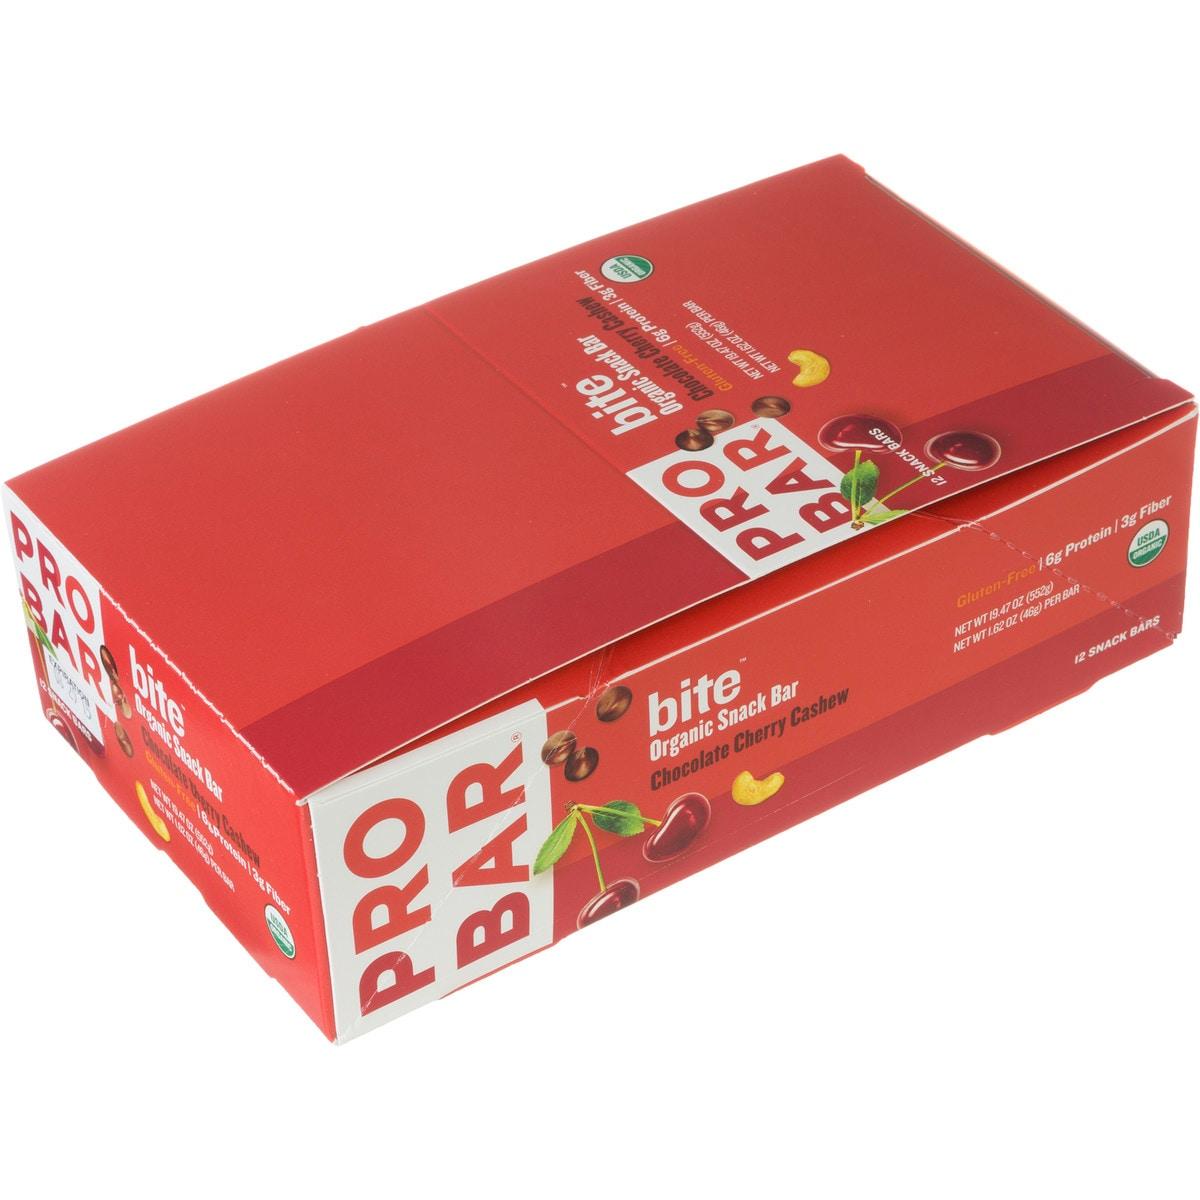 ProBar Bite Bar  12 Pack Chocolate Cherry Cashew One Size